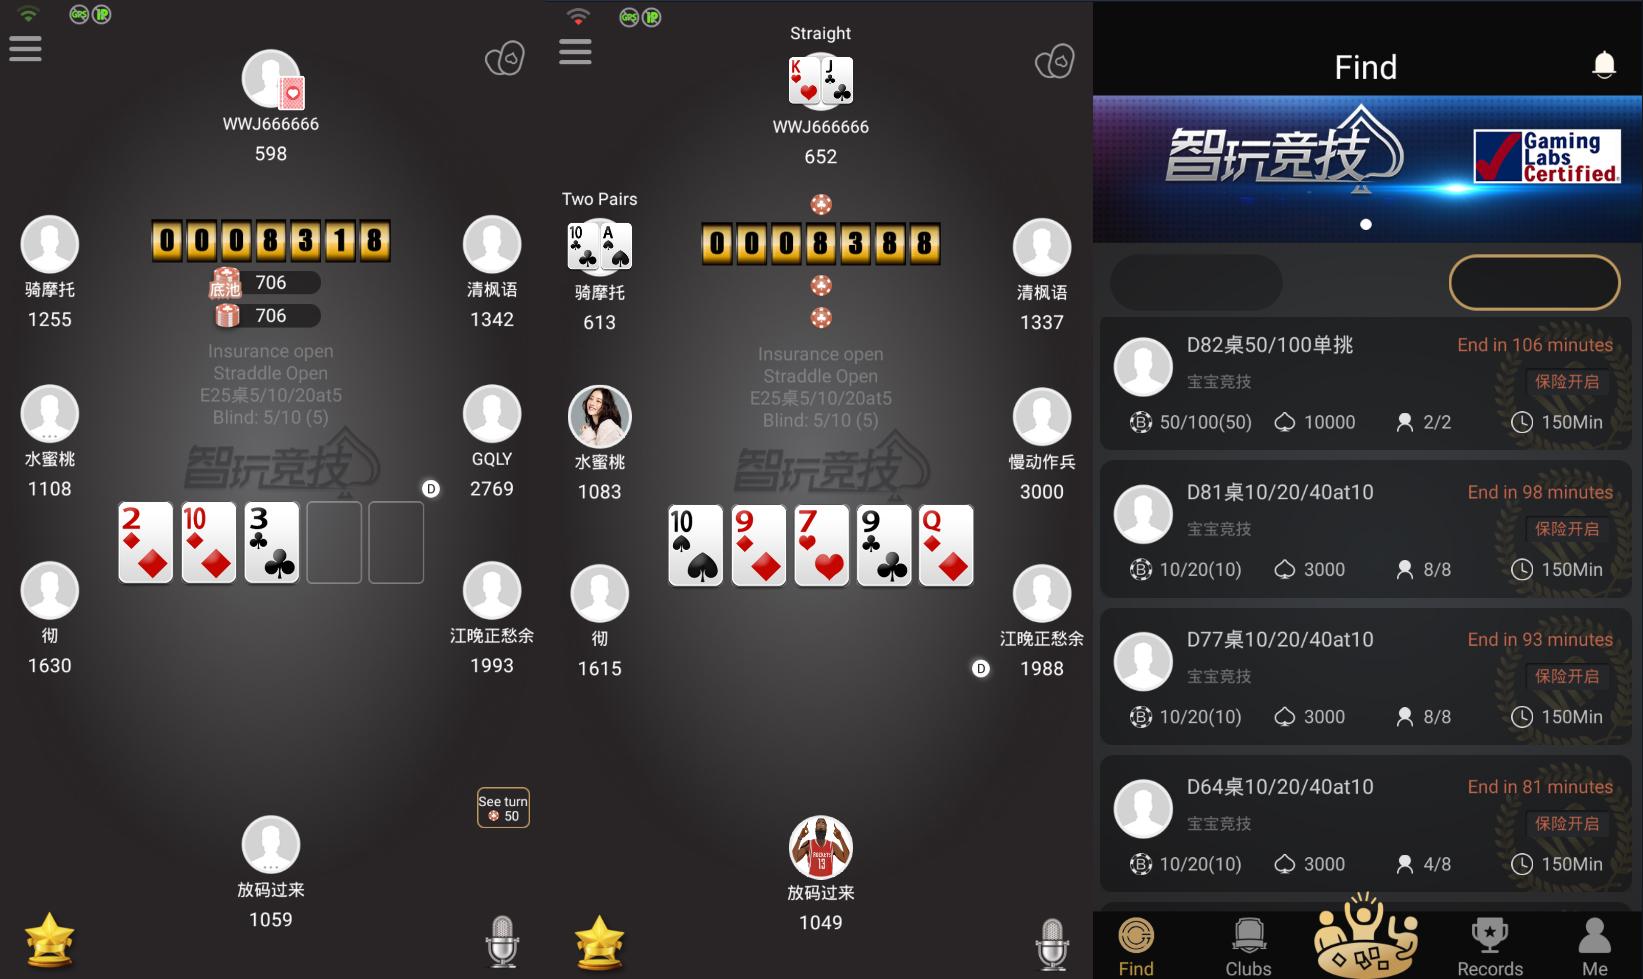 Pokerspades Lobby